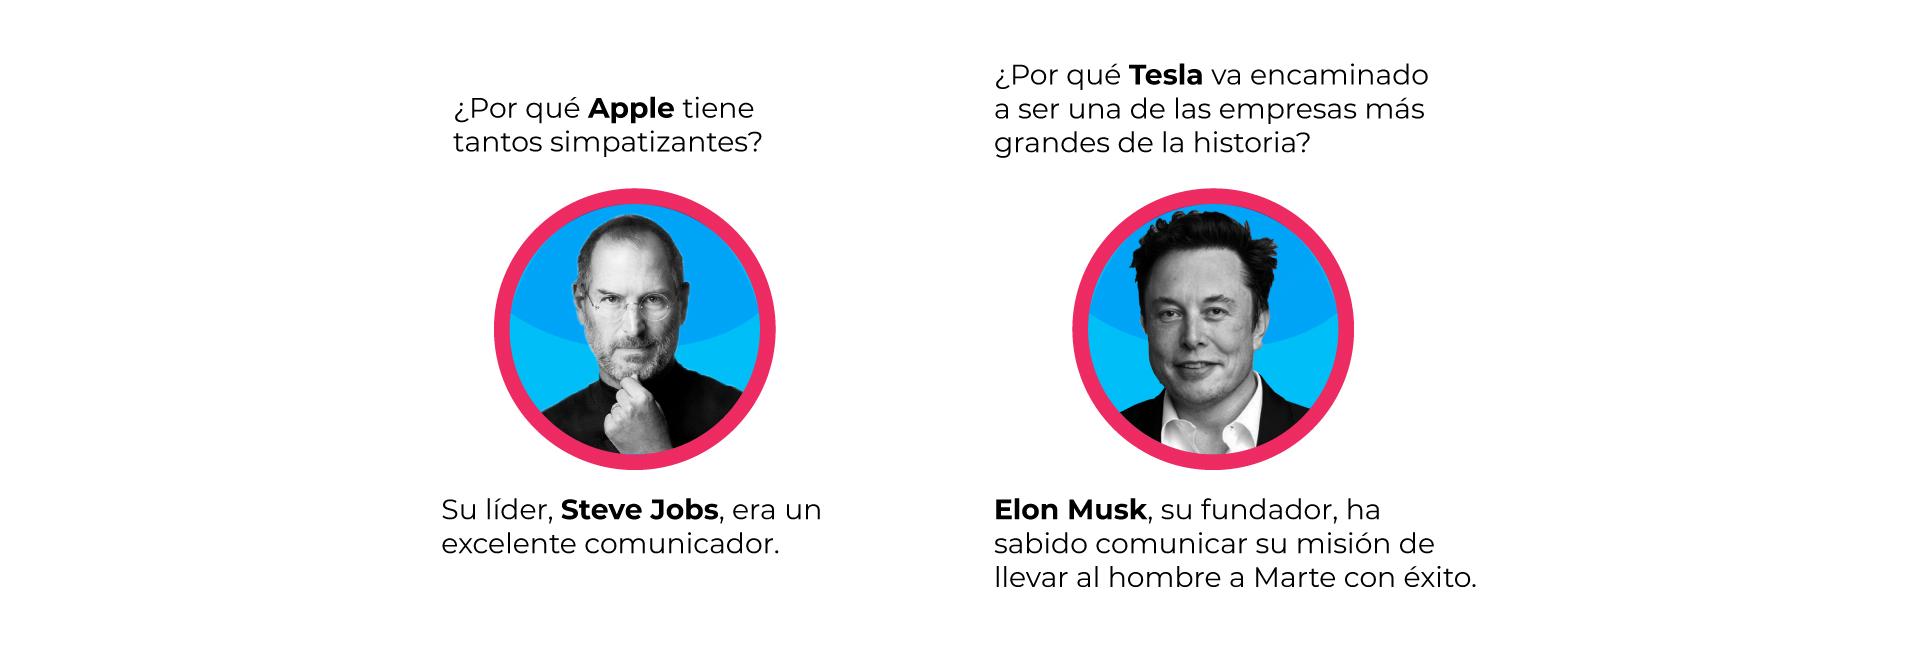 lideres_comunicacion_empresarial